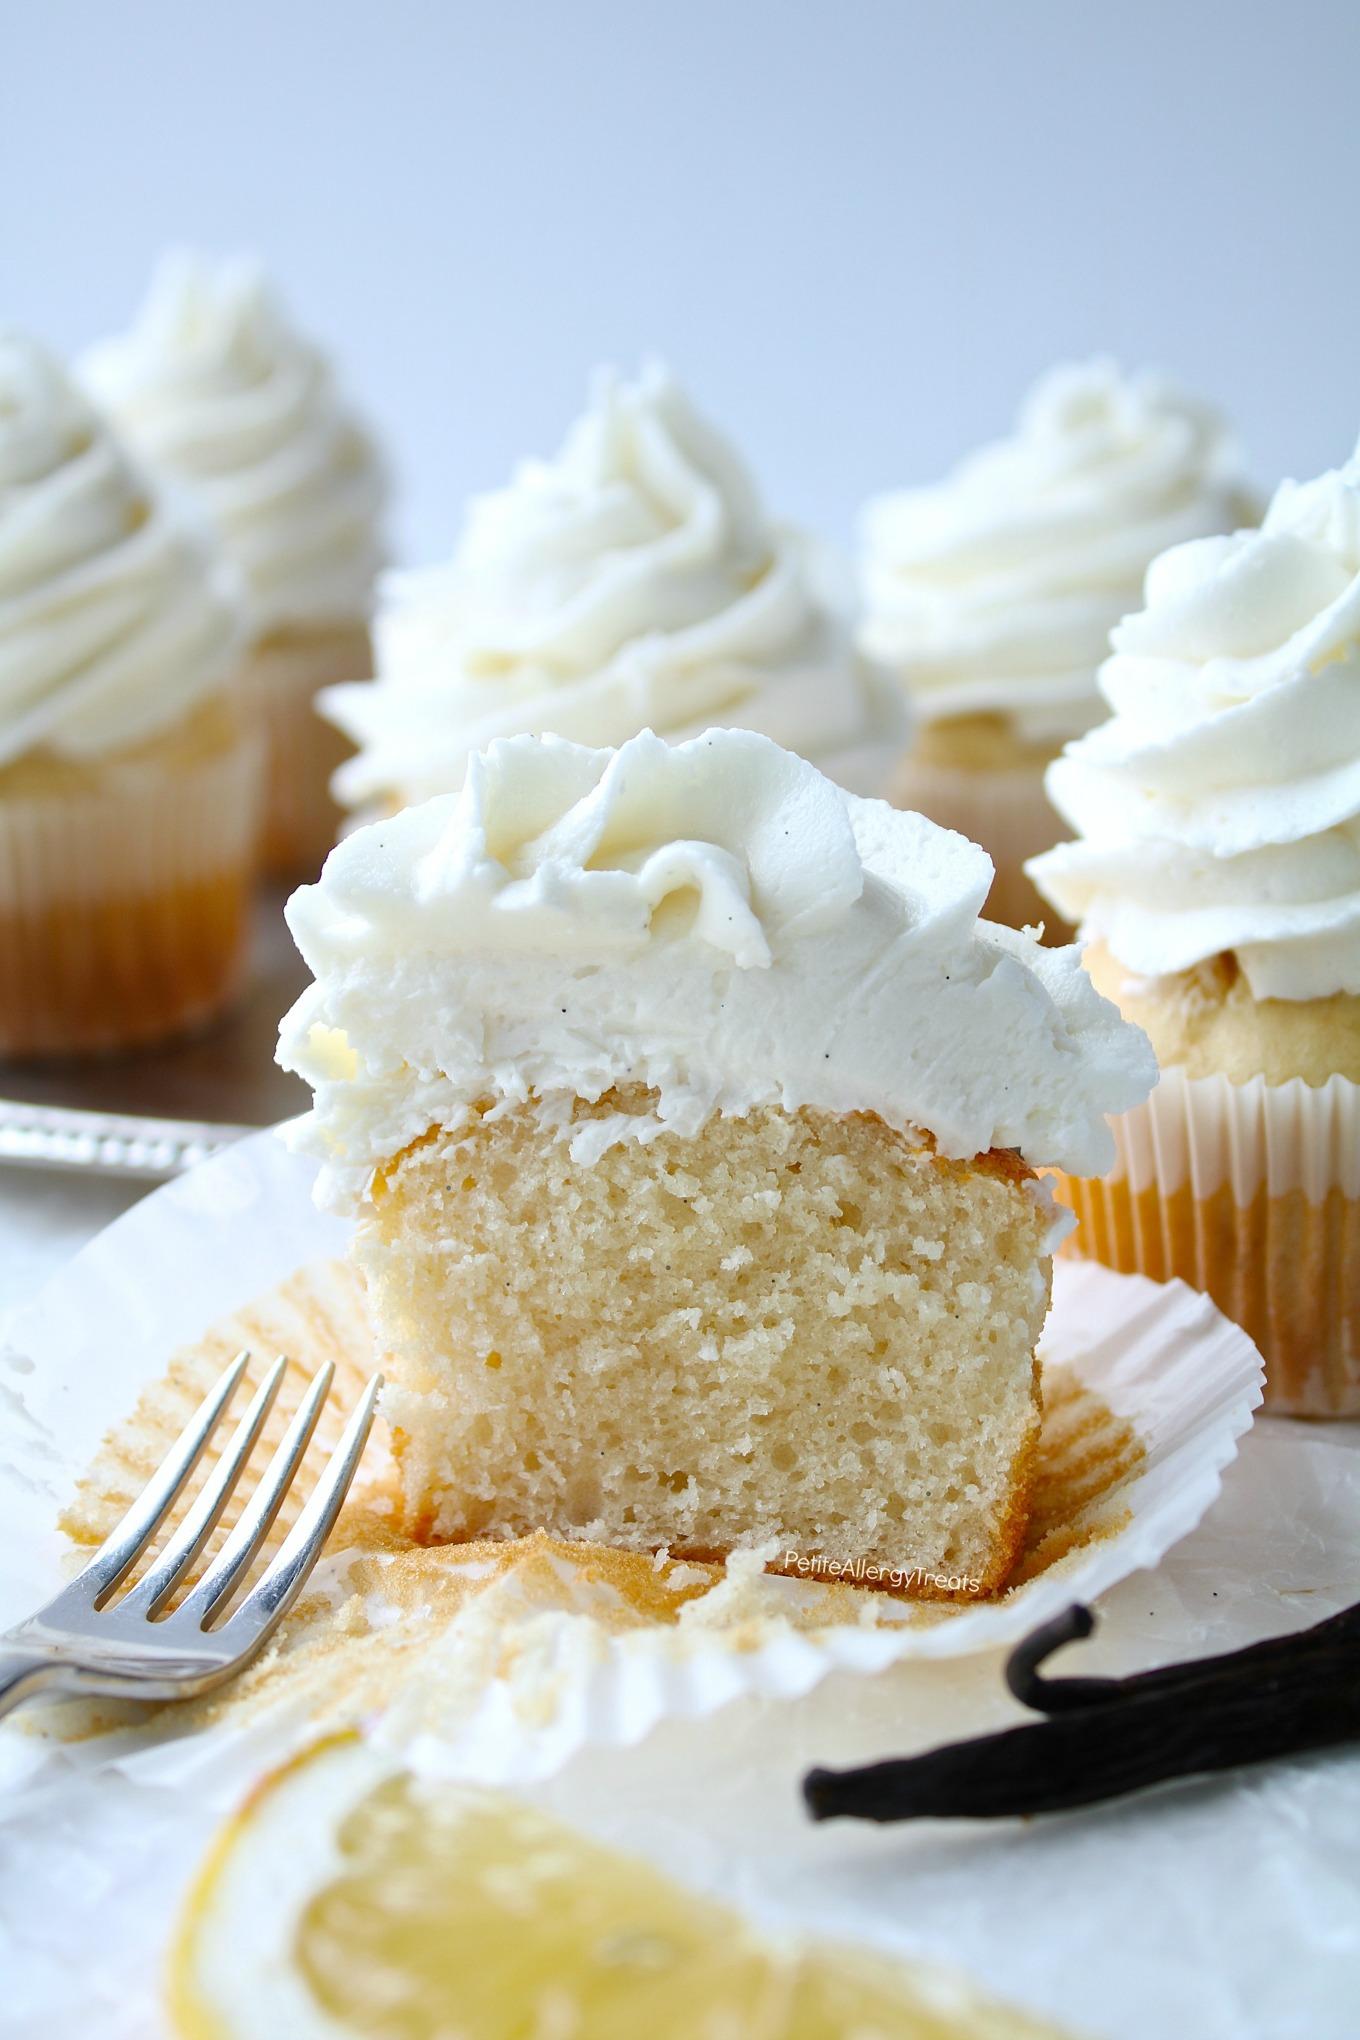 Vegan Vanilla Cupcakes Recipe (gluten free dairy free egg free)- Bakery style real vanilla bean cupcakes. Food Allergy friendly. Top 8 Free & Allergy Amulet.